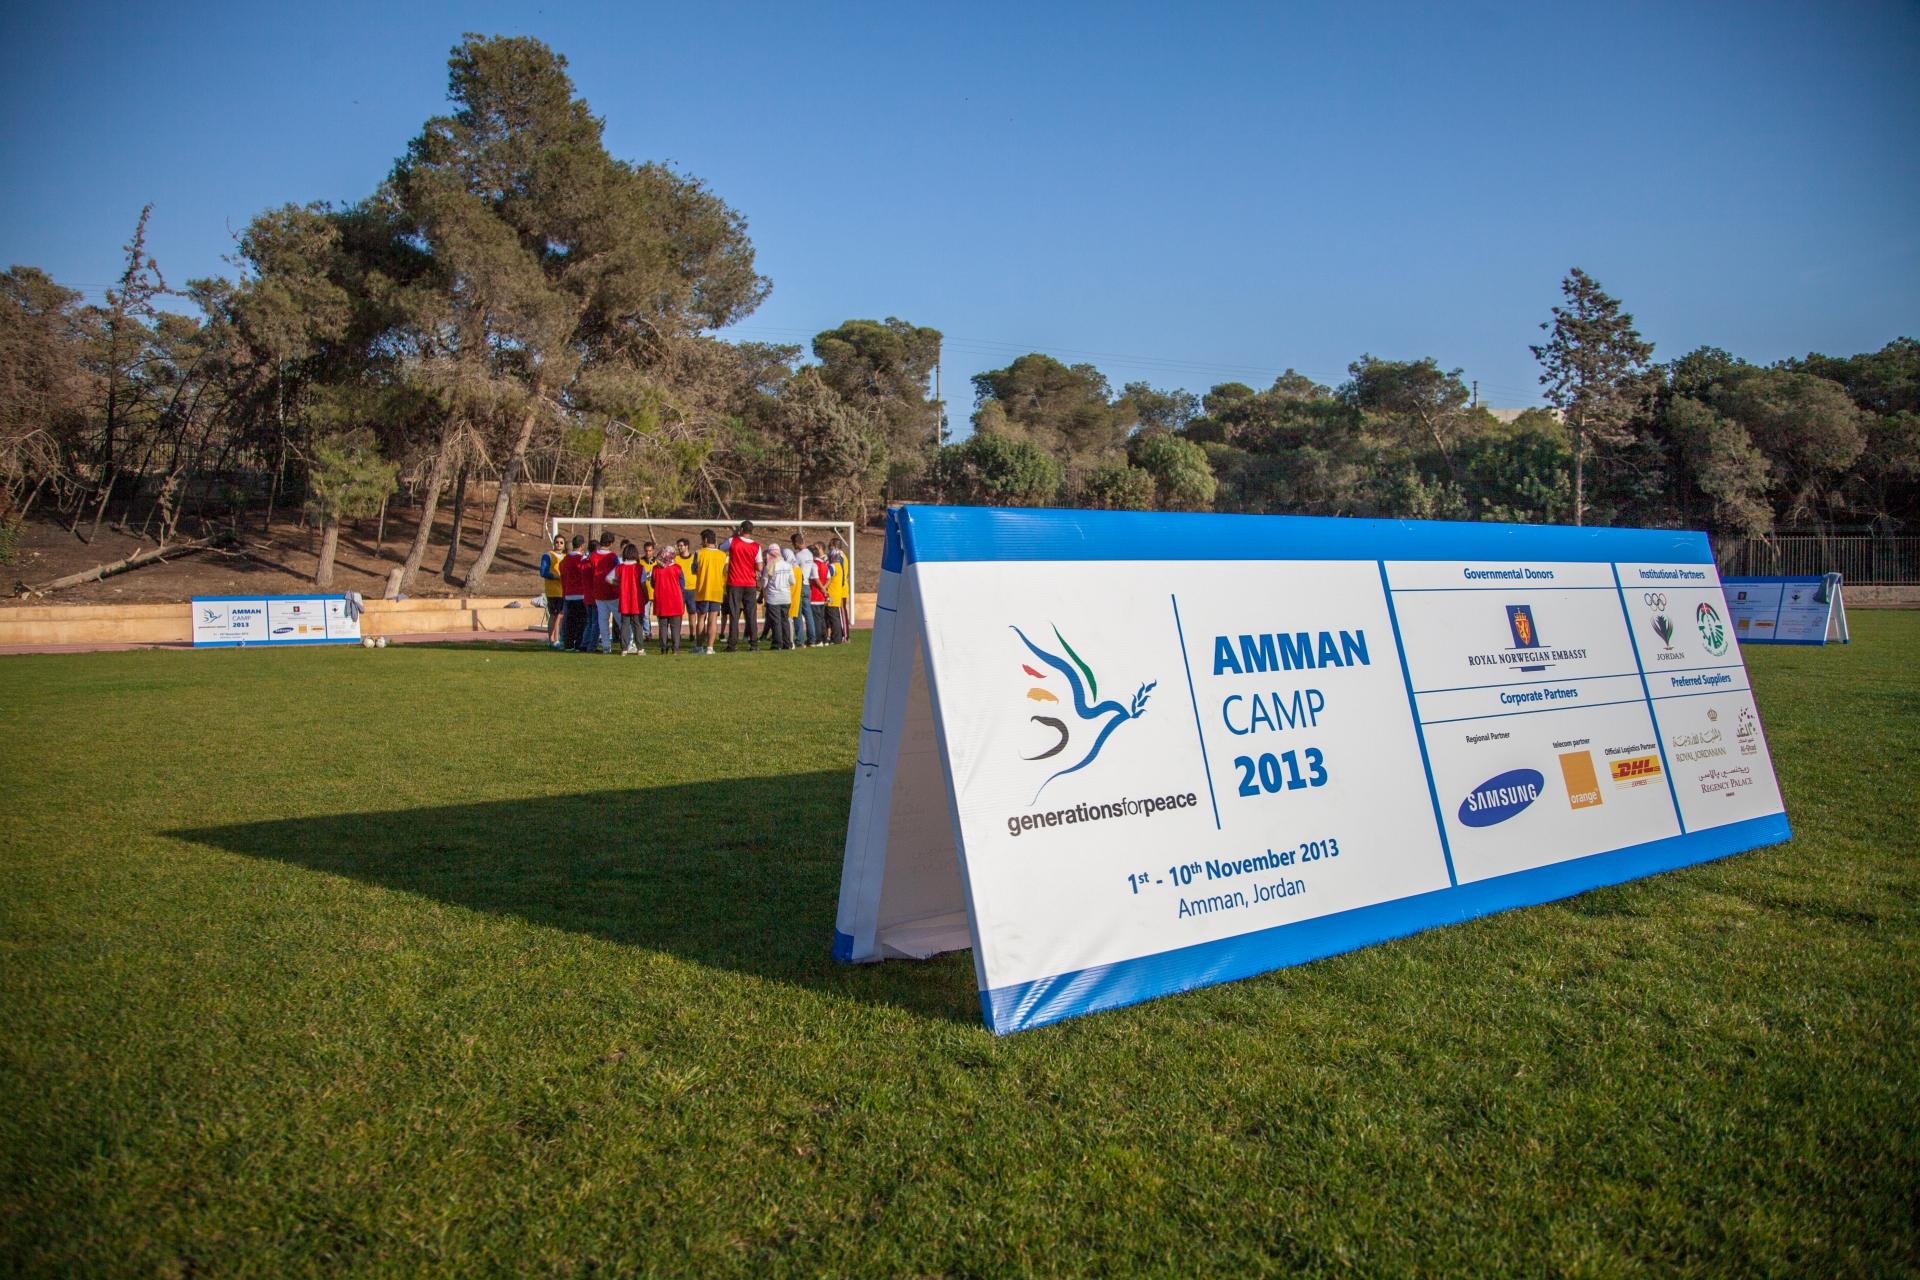 Amman Camp 2013